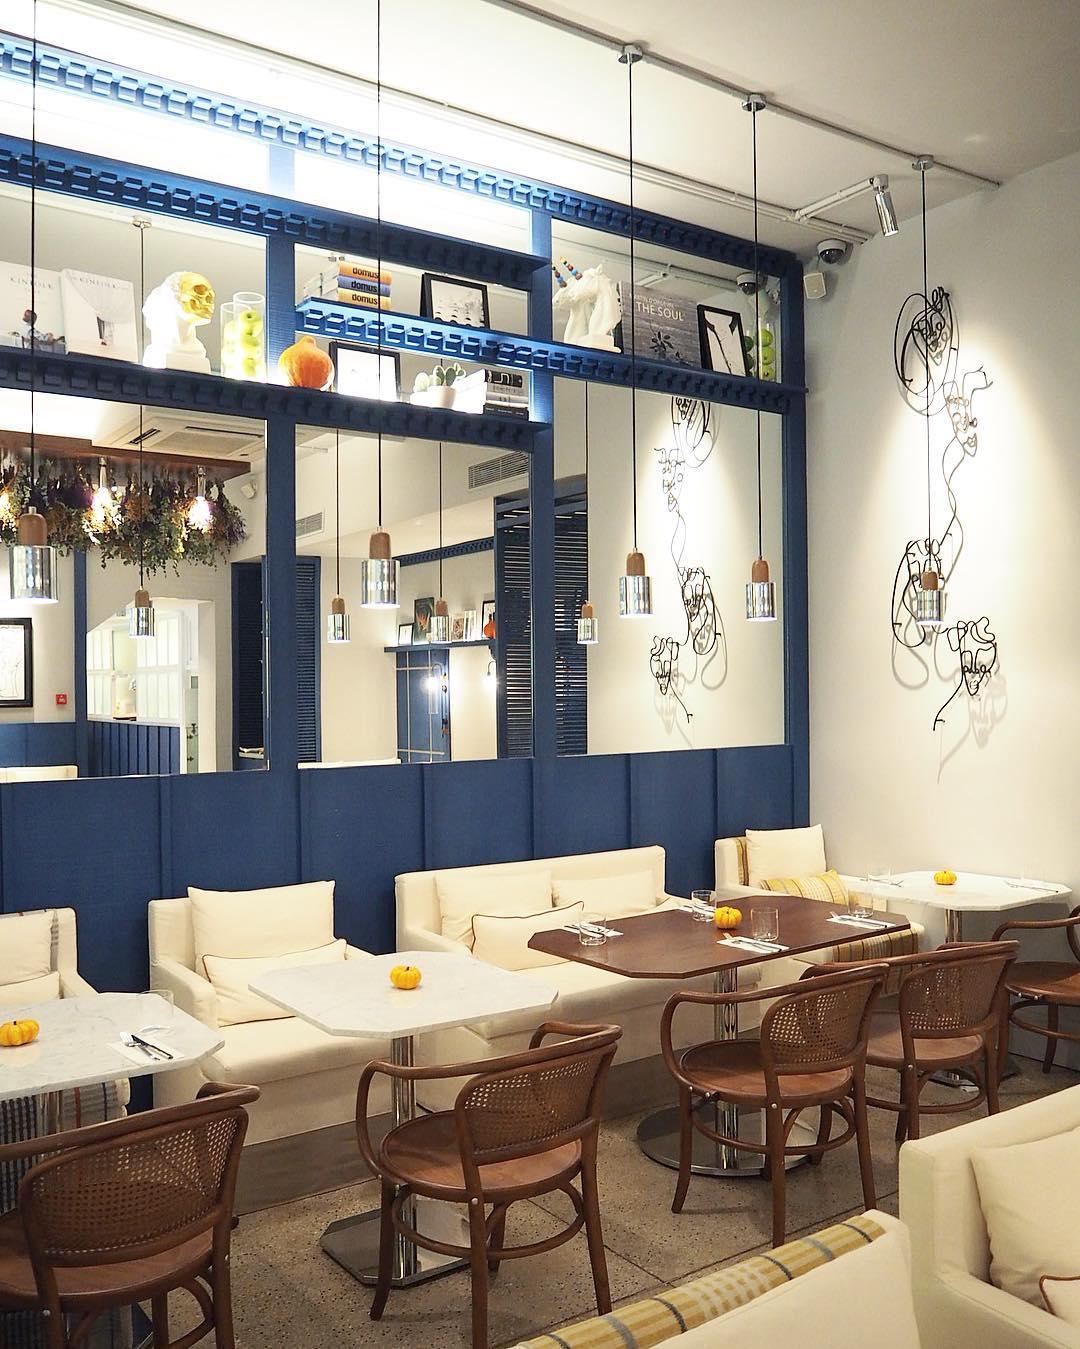 İstanbul'dan Yeni Mekanlar, Yeni Tatlar | SAM Kitchen & Bar